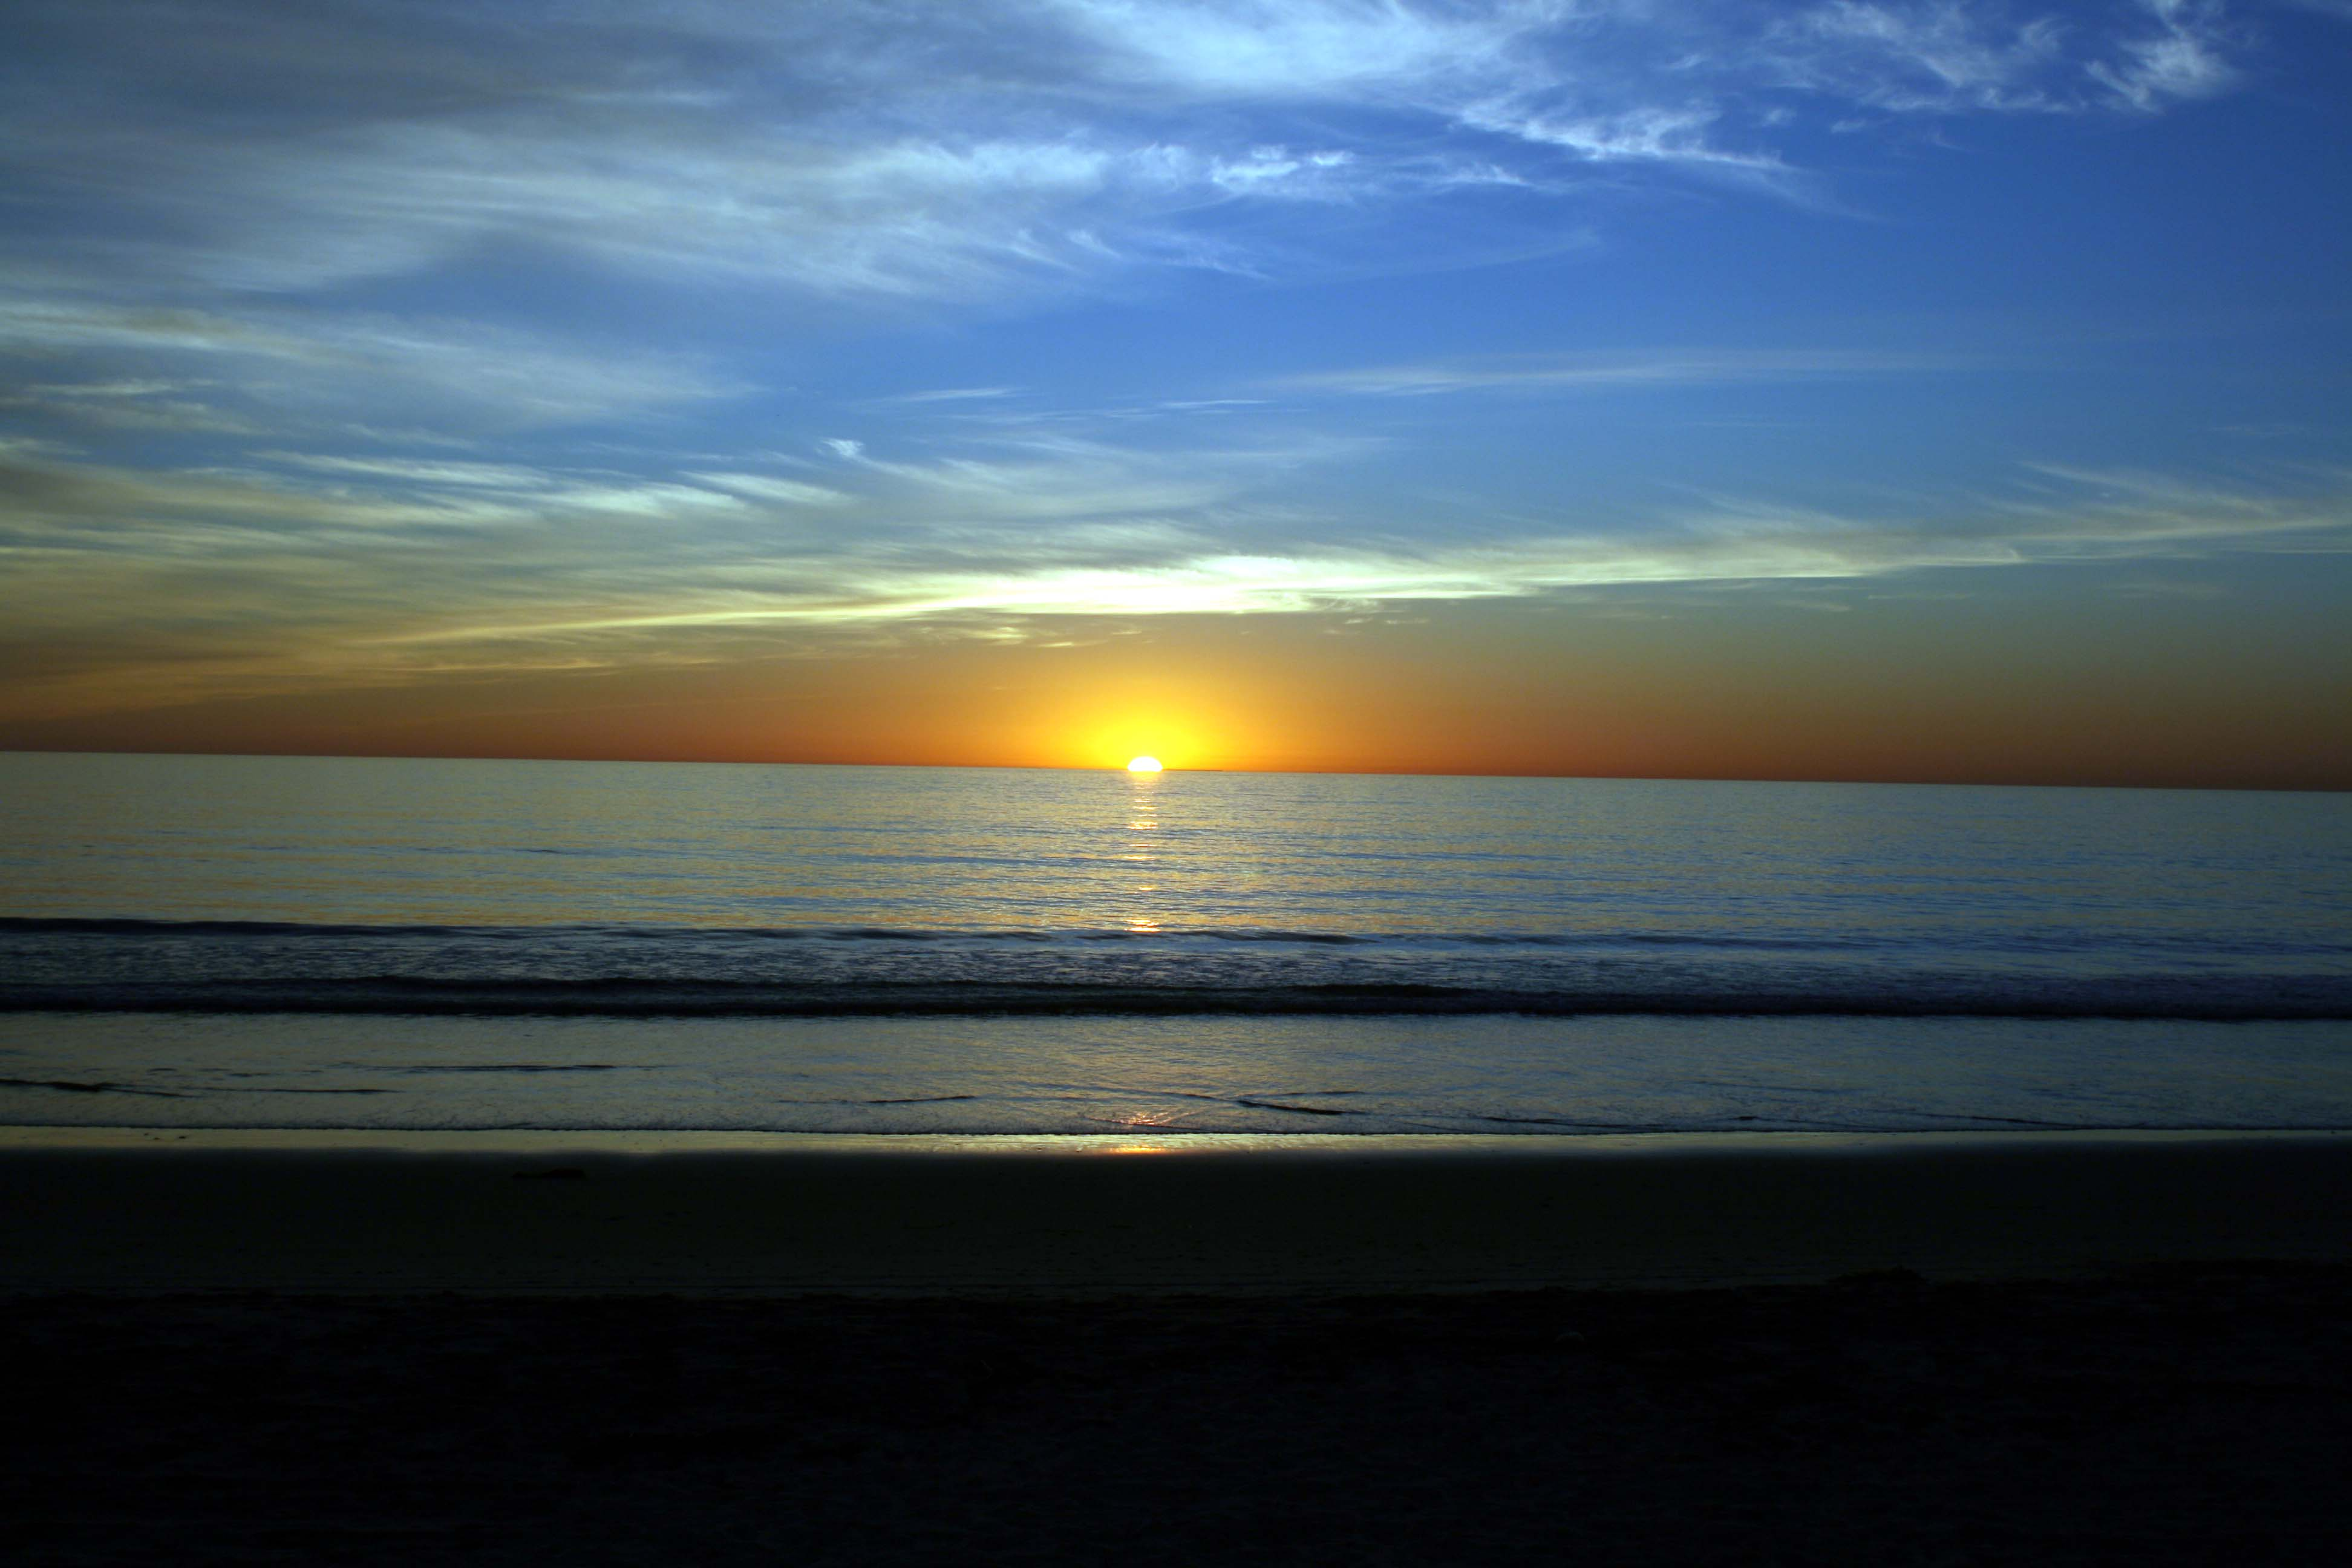 Sunset, Carlsbad, CA